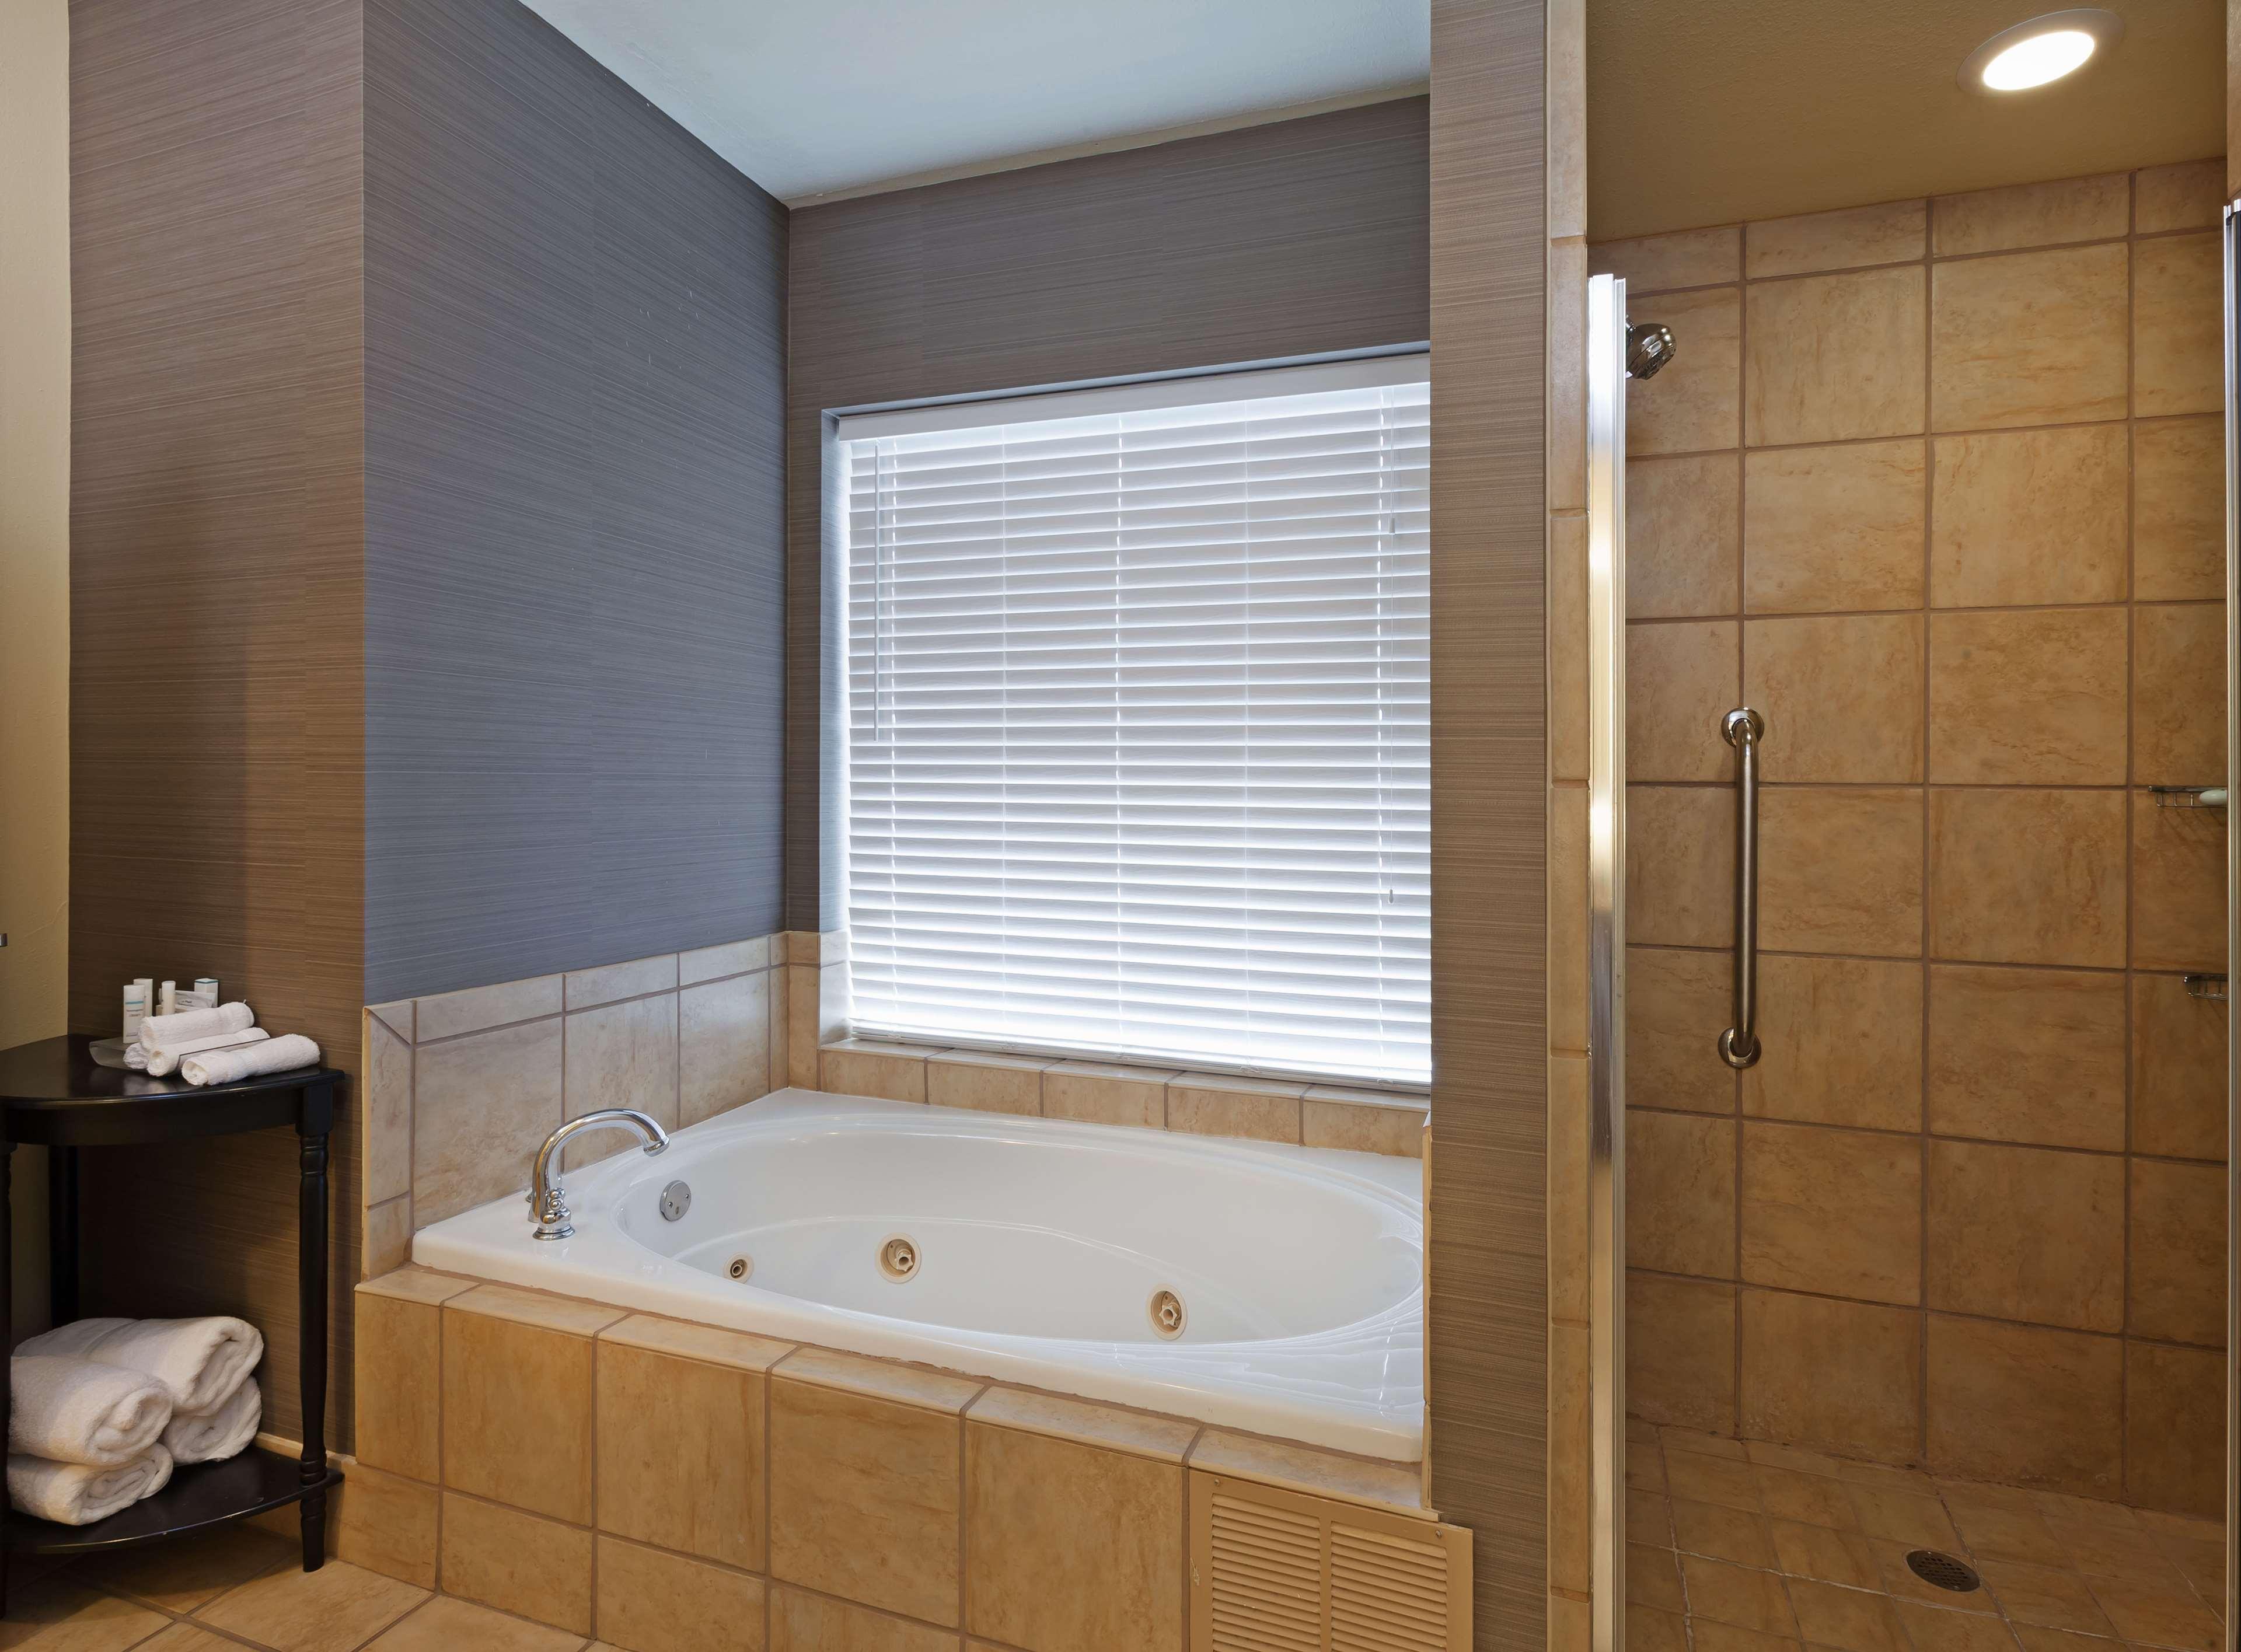 Homewood Suites by Hilton Wichita Falls image 13